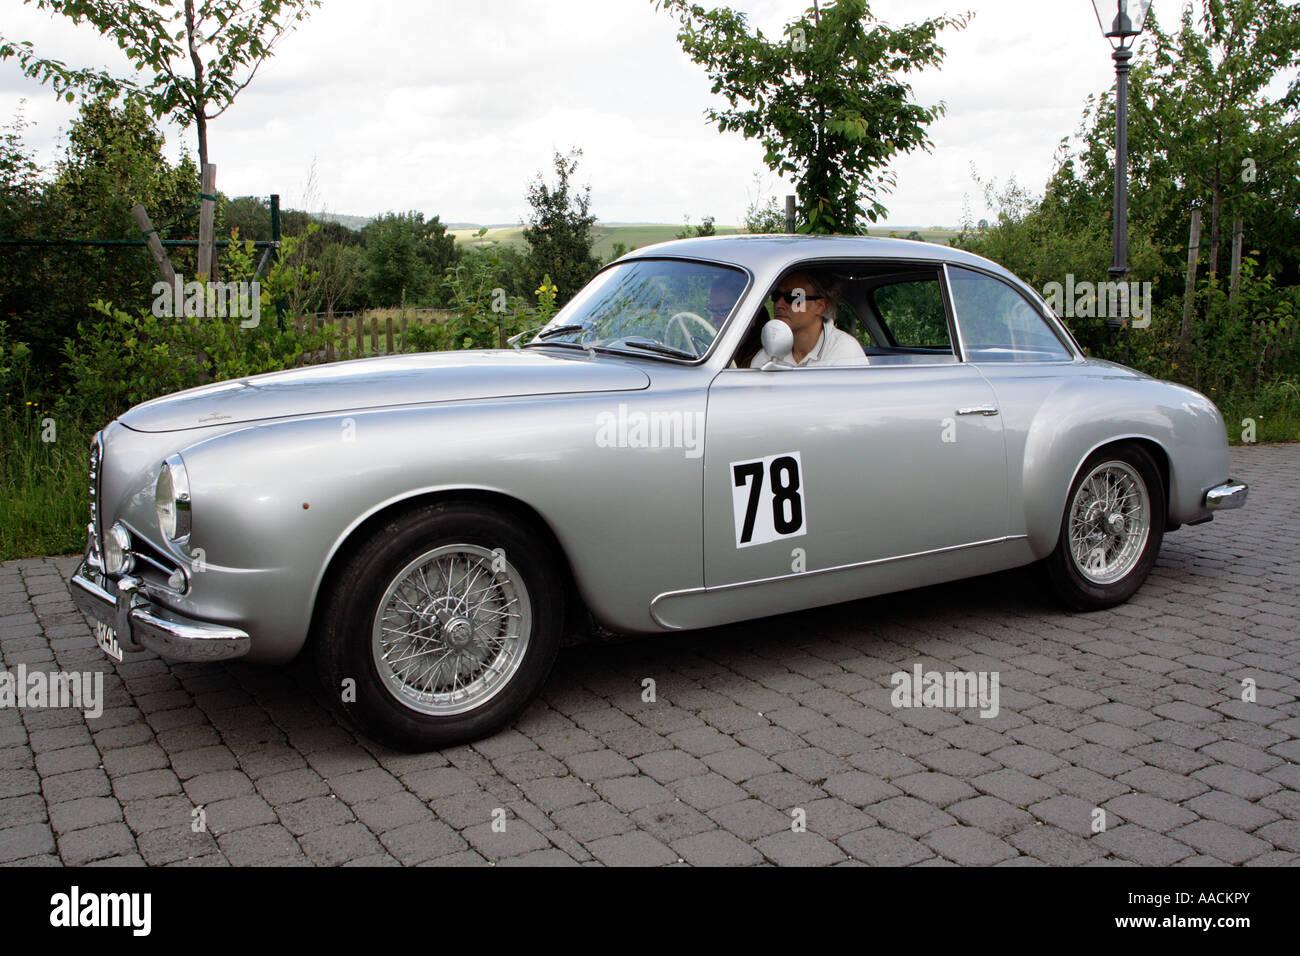 Vintage car Alfa Romeo 1900 Super Sprint of 1955, vintage car race Wiesbaden 2007, Hessenpark, Neu-Anspach, Taunus, - Stock Image